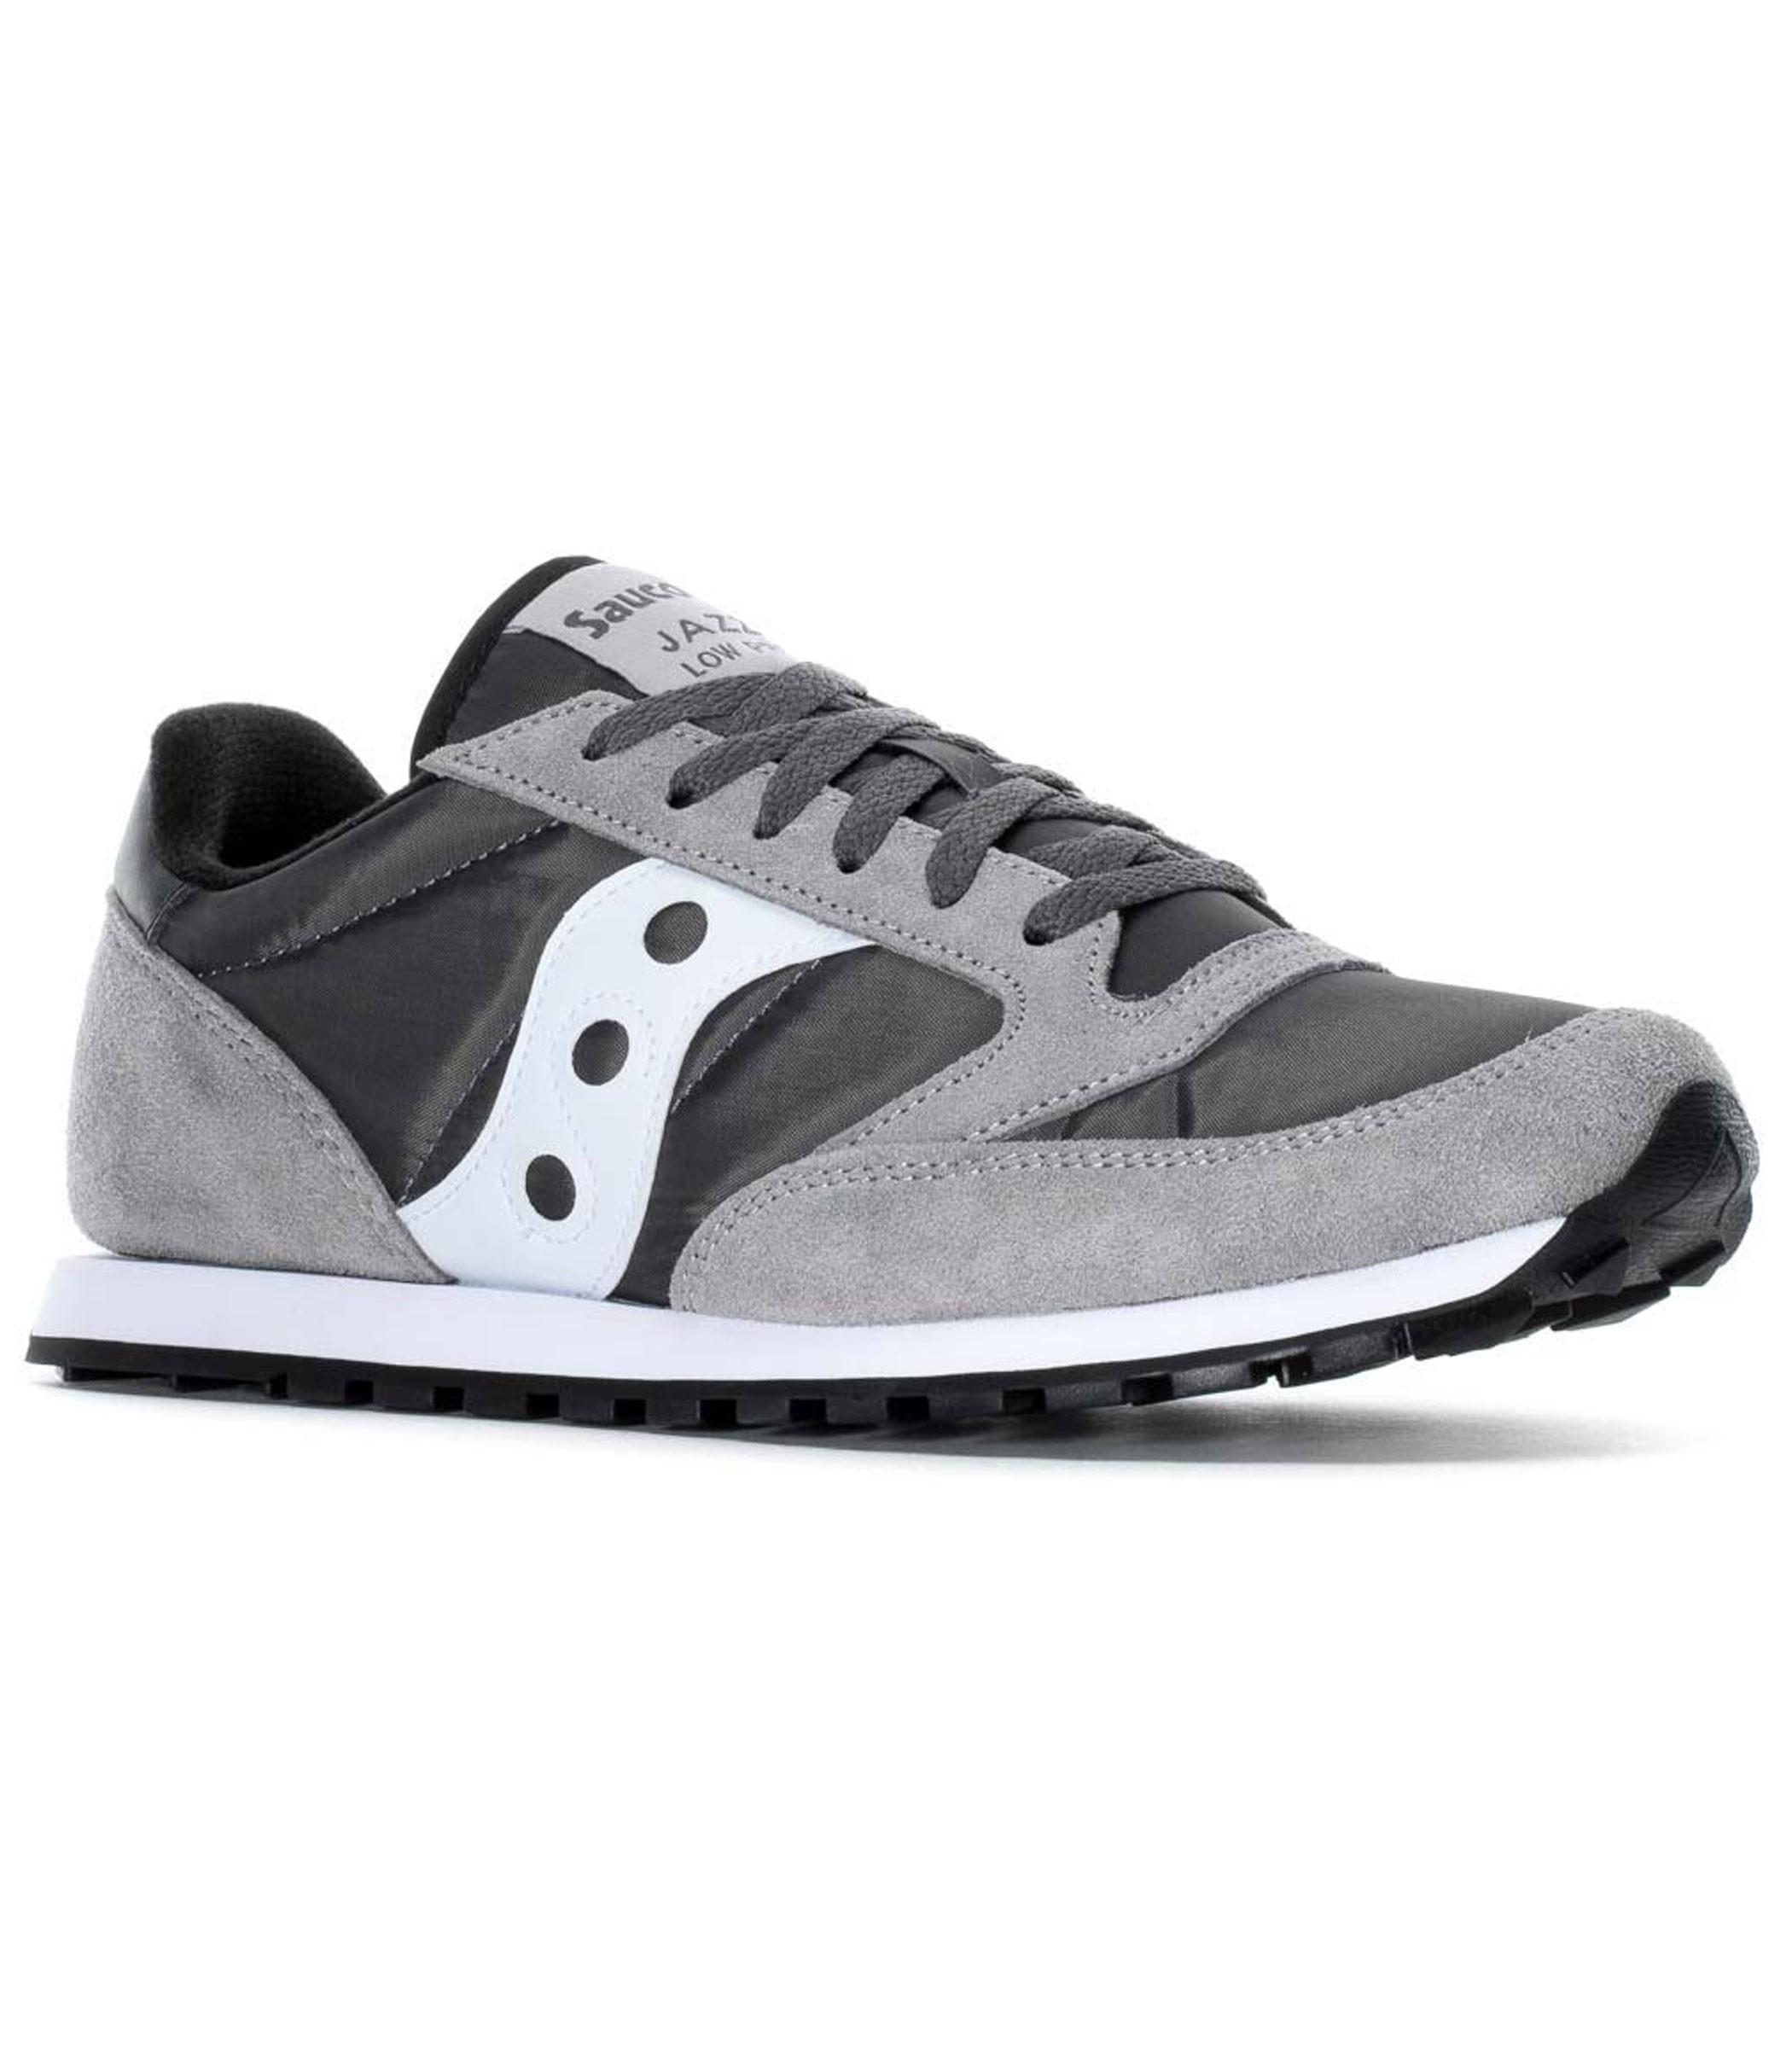 Uomo Rif S2866 248 Pro Low Jazz Sneakers Saucony Scarpe qwR6vXpx